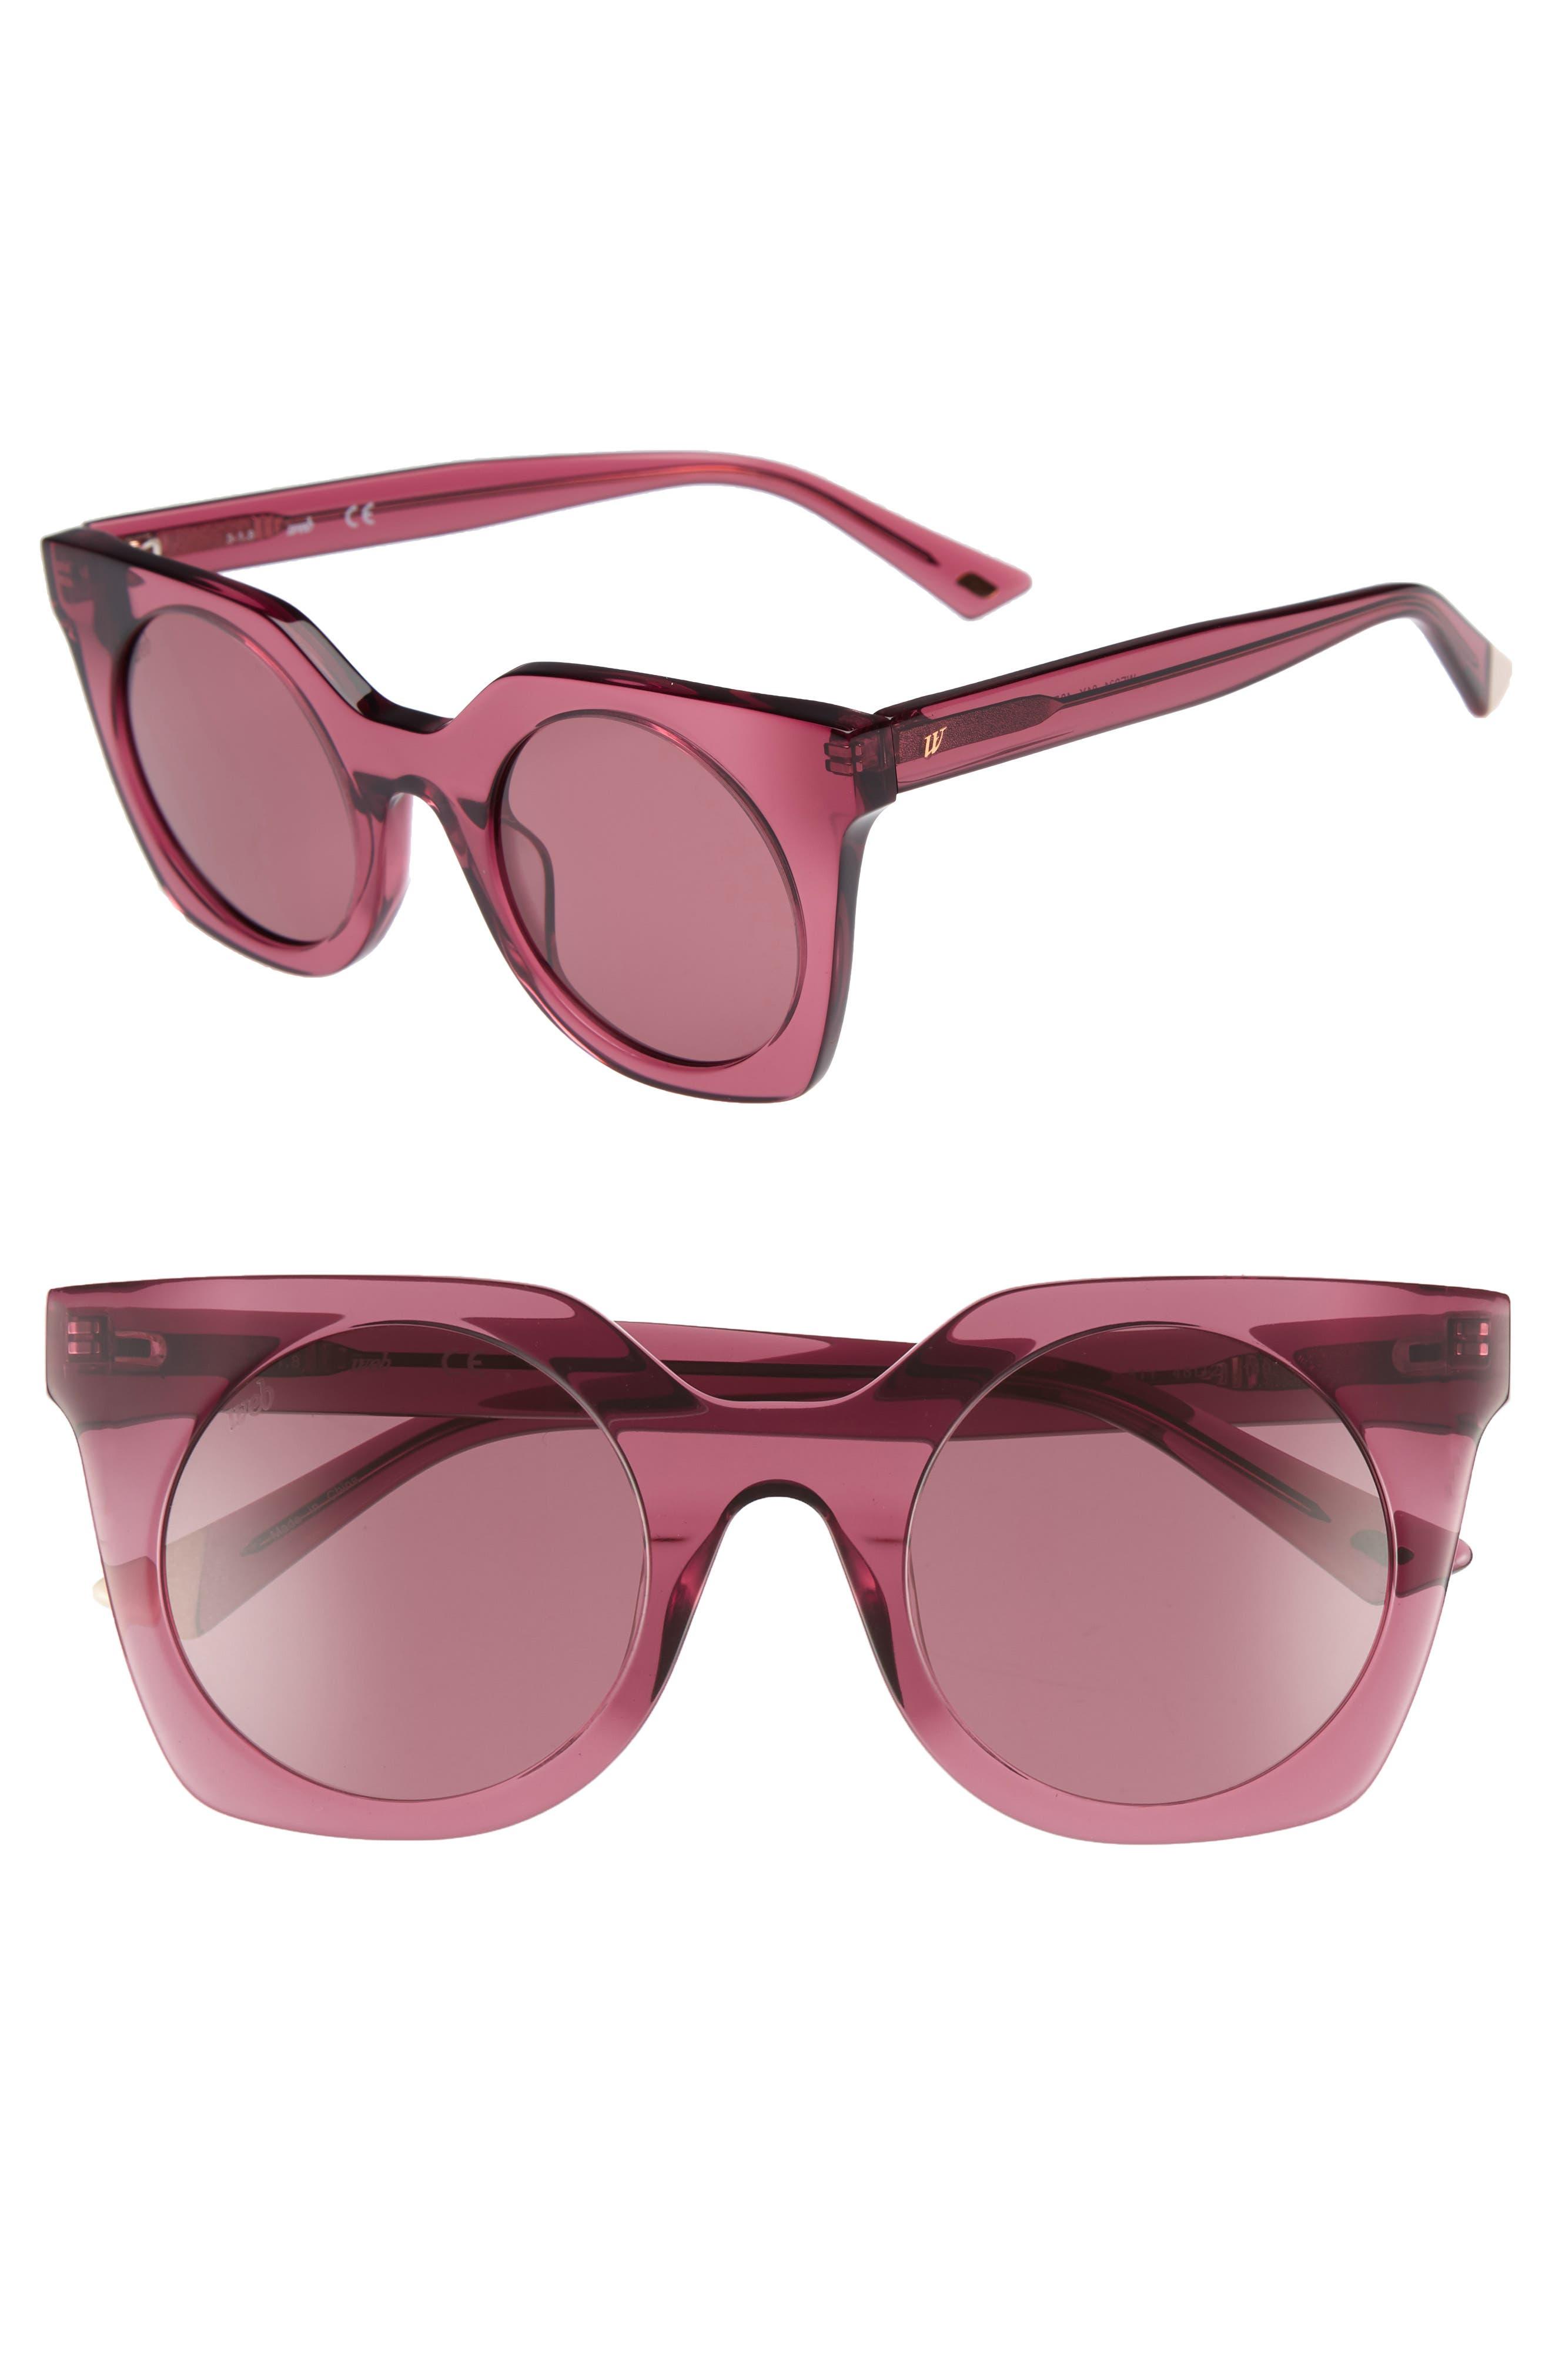 48mm Sunglasses,                         Main,                         color, Shiny Violet/ Violet